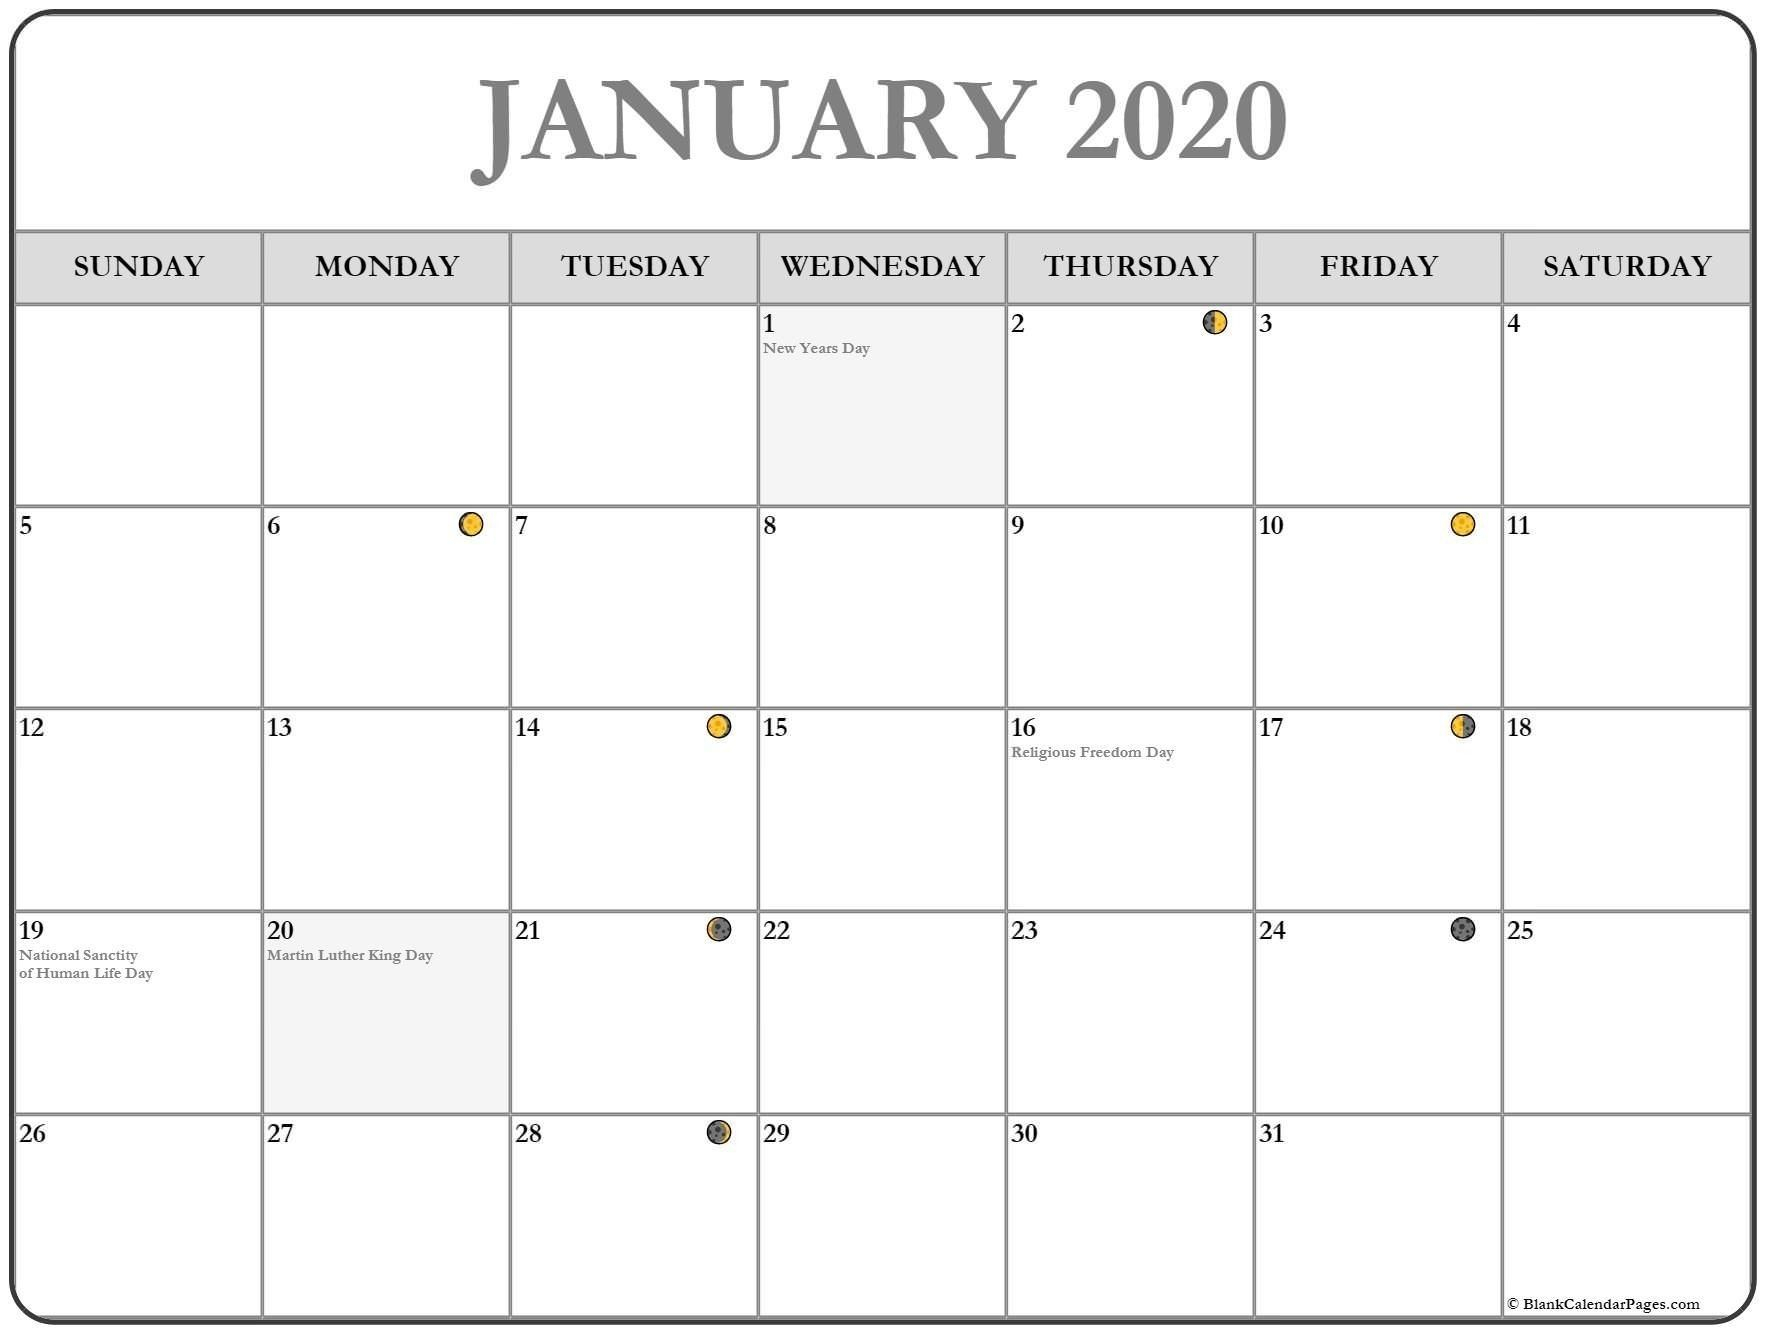 January 2020 Lunar Calendar